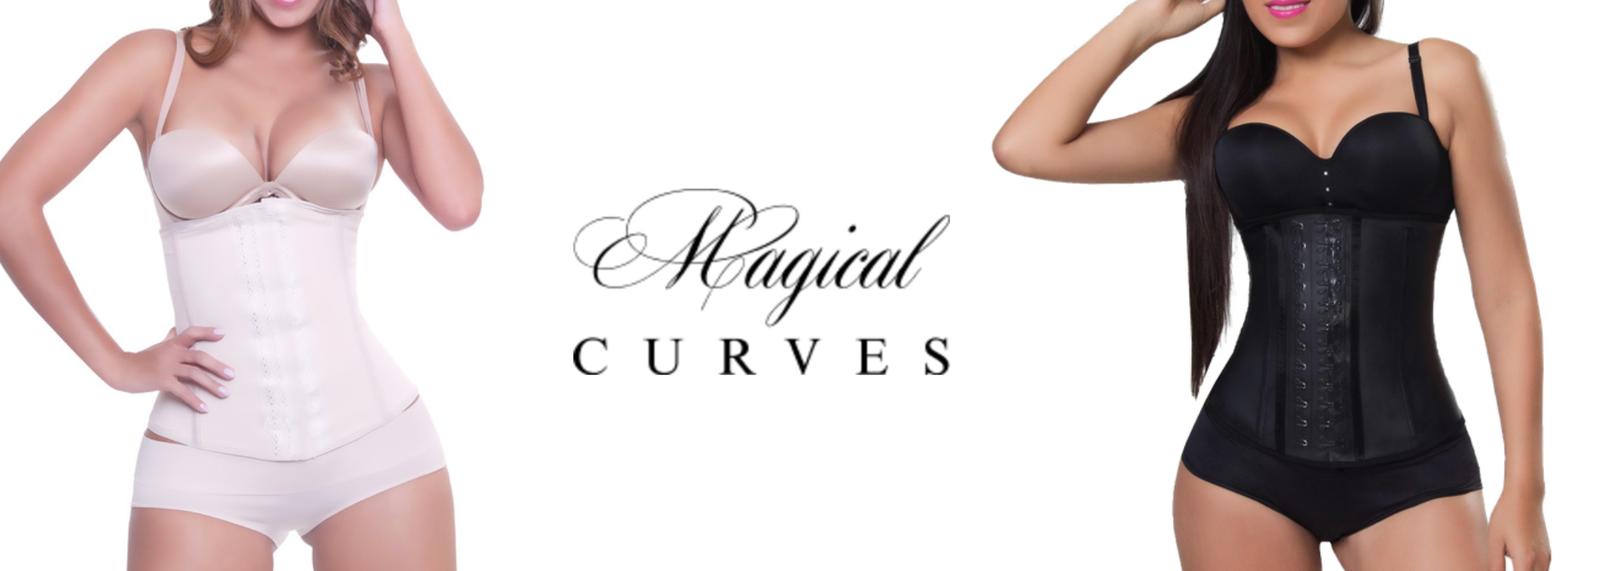 Magical Curves